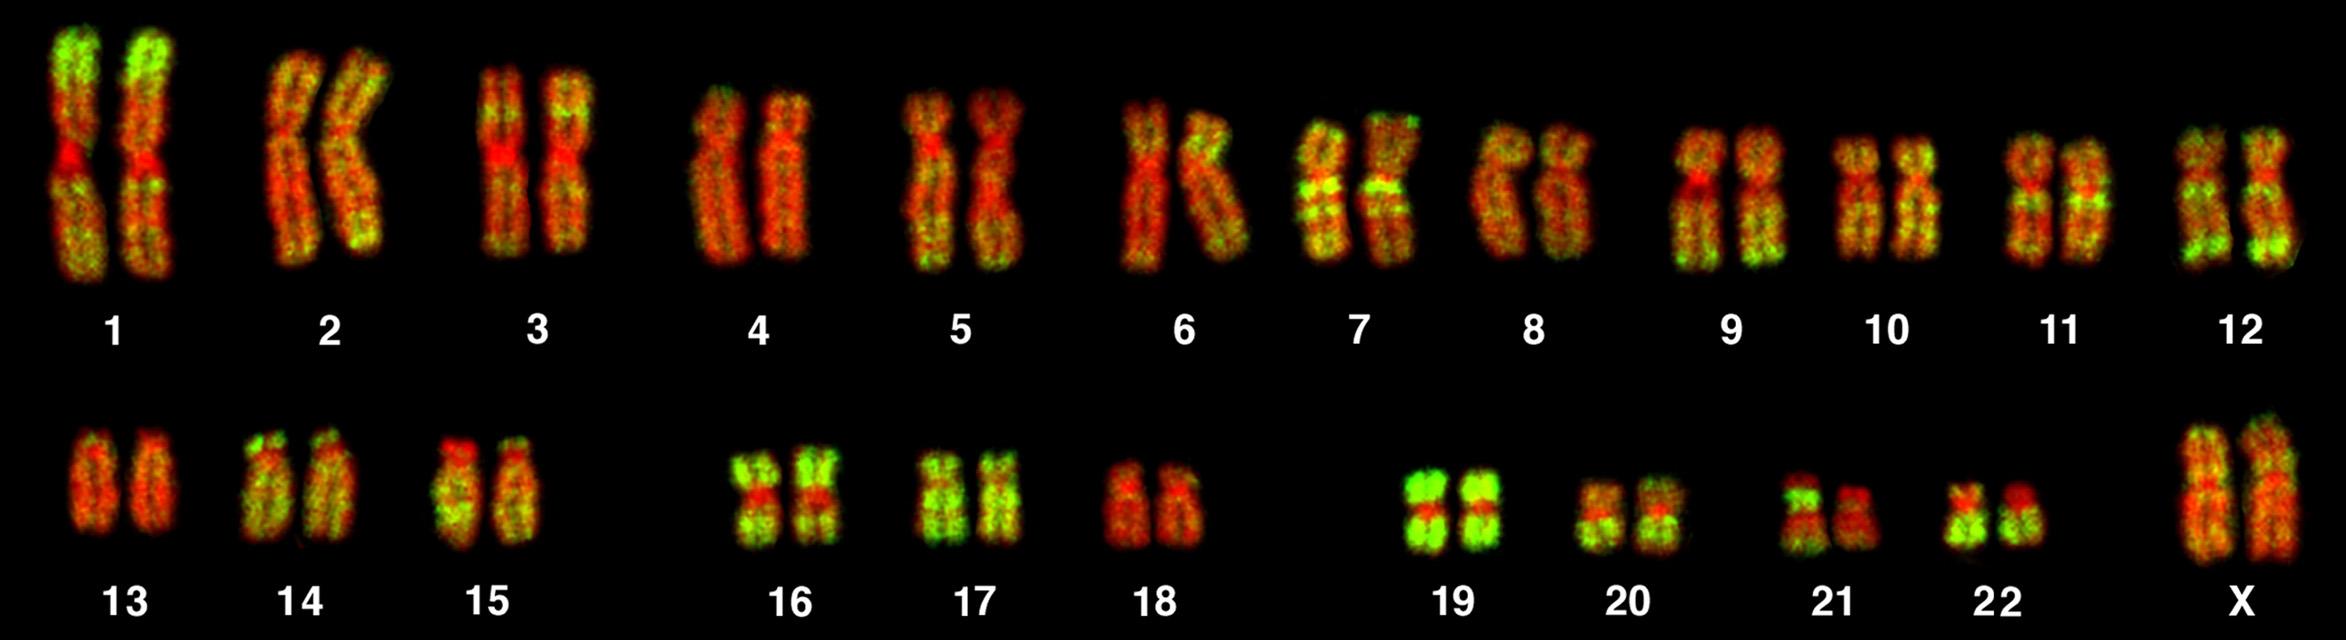 Хромосома